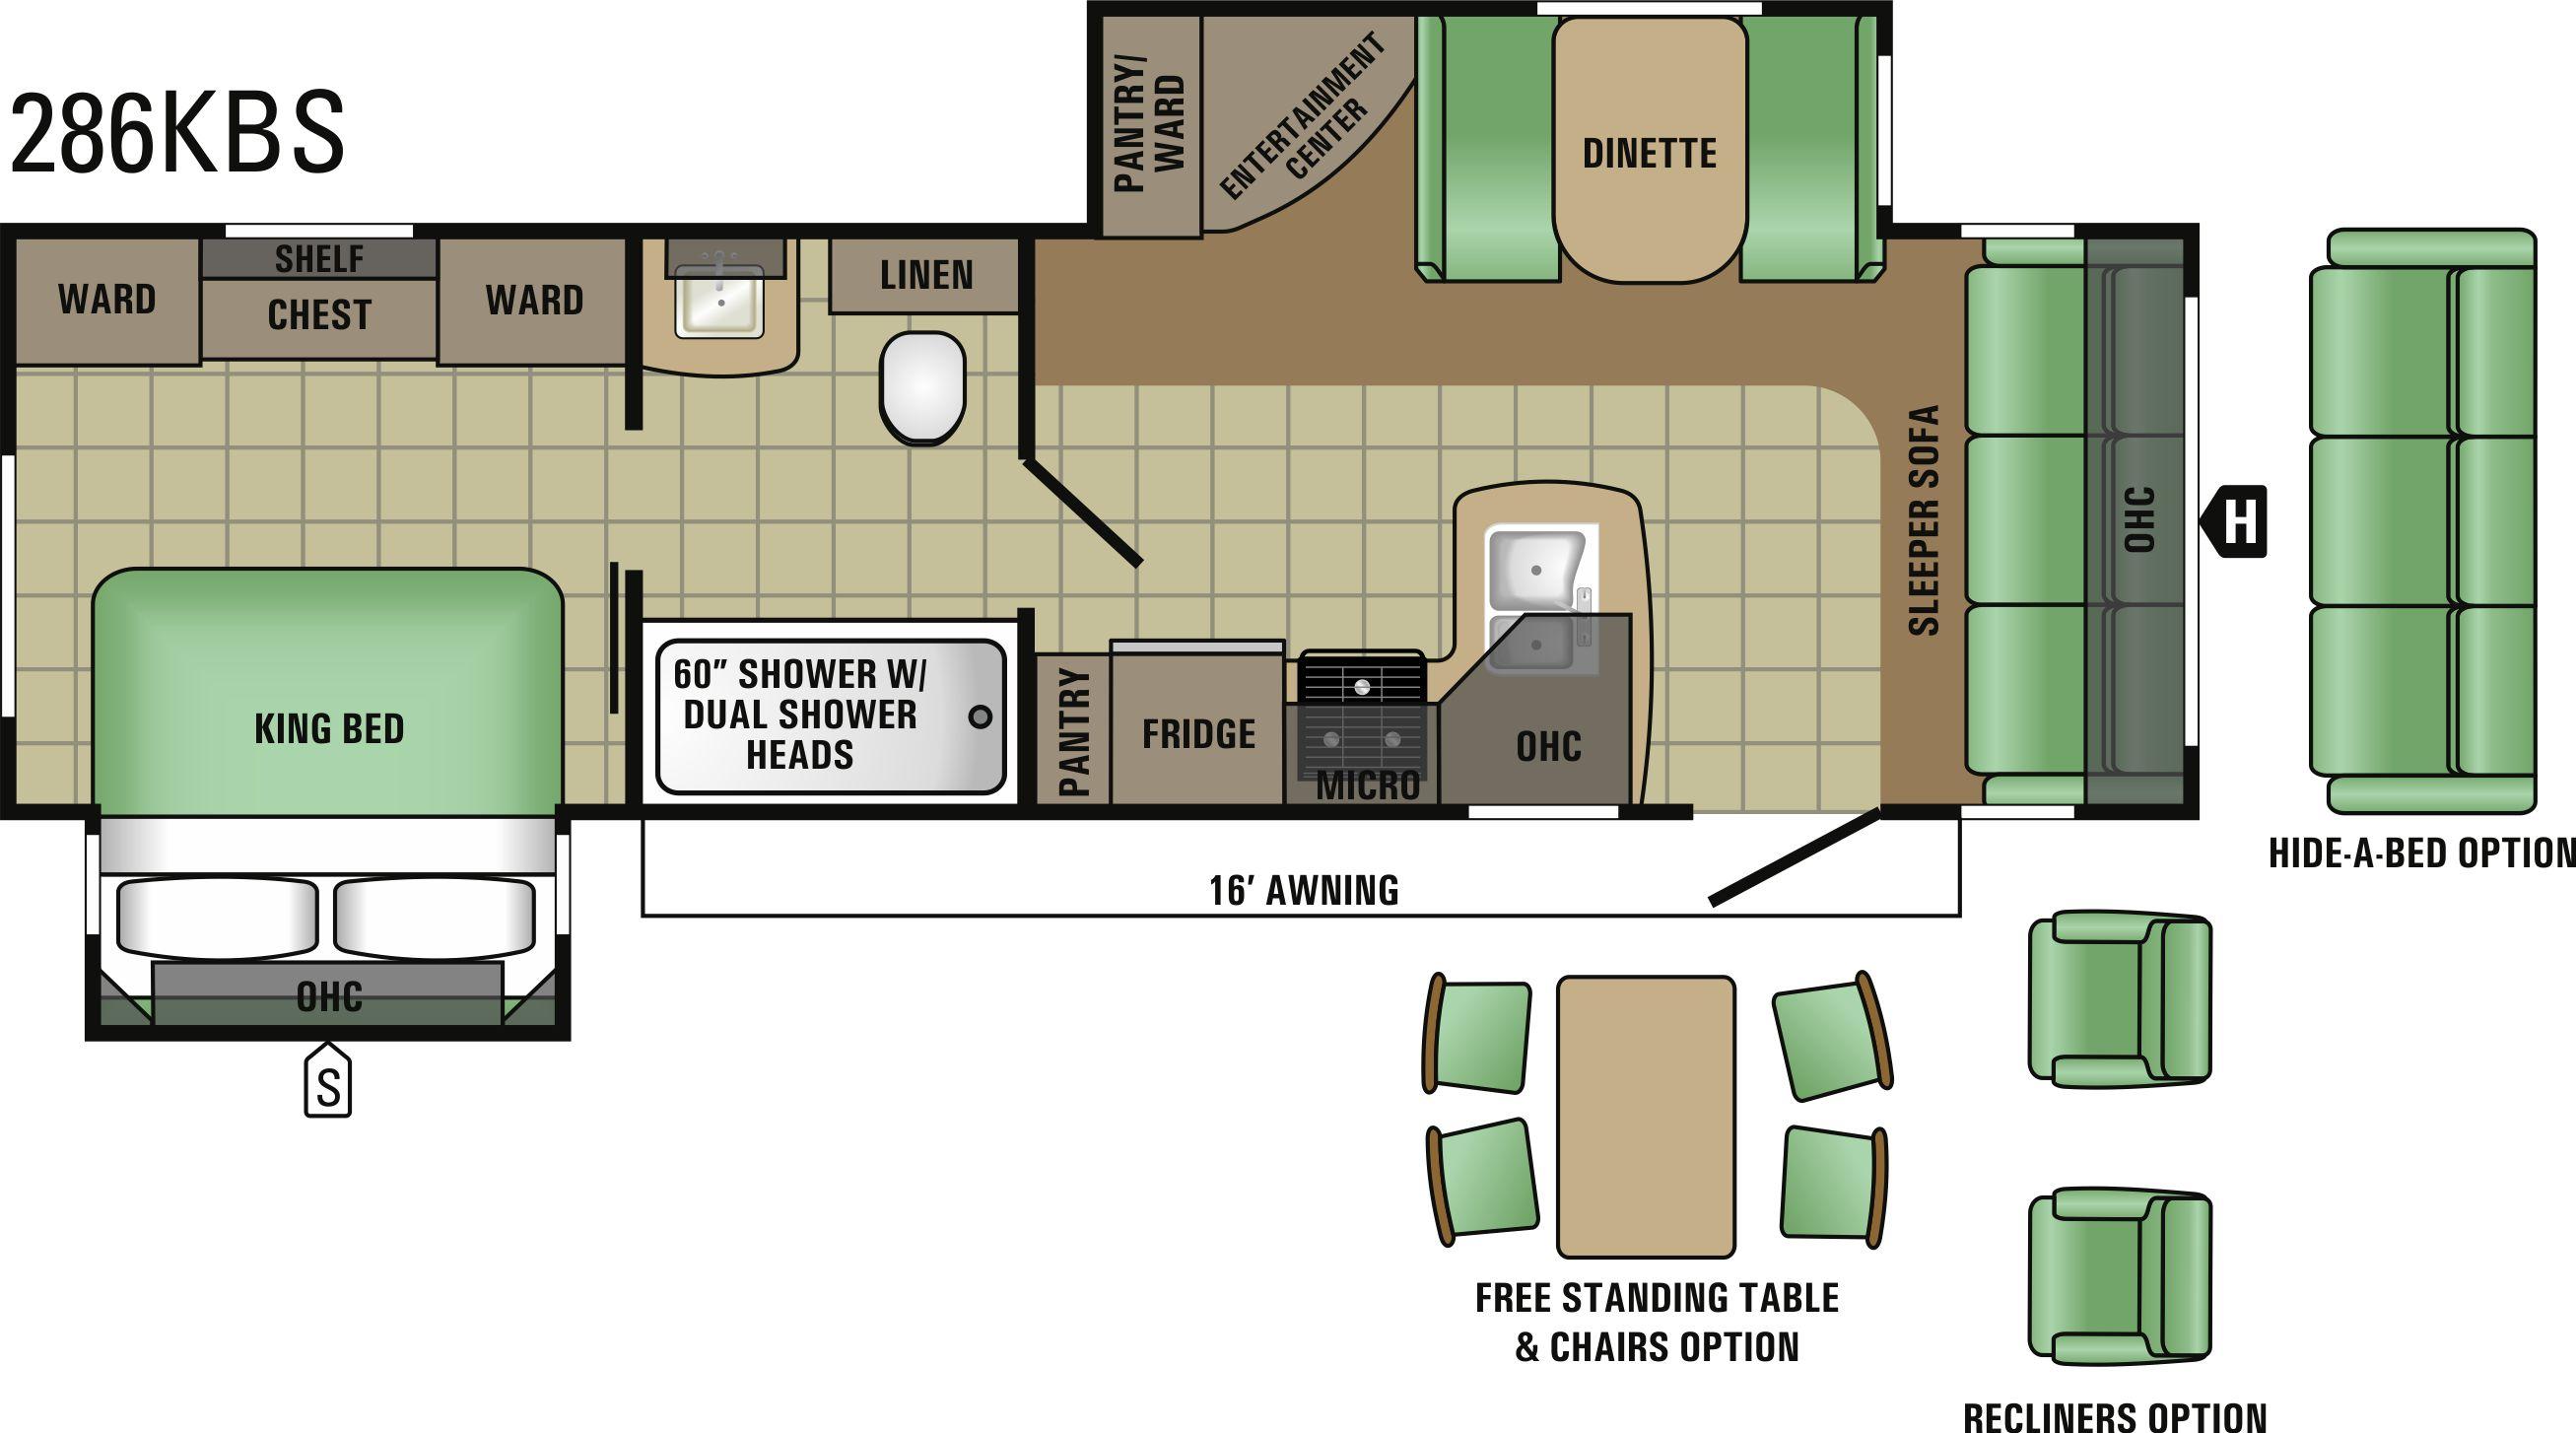 286KBS Floorplan